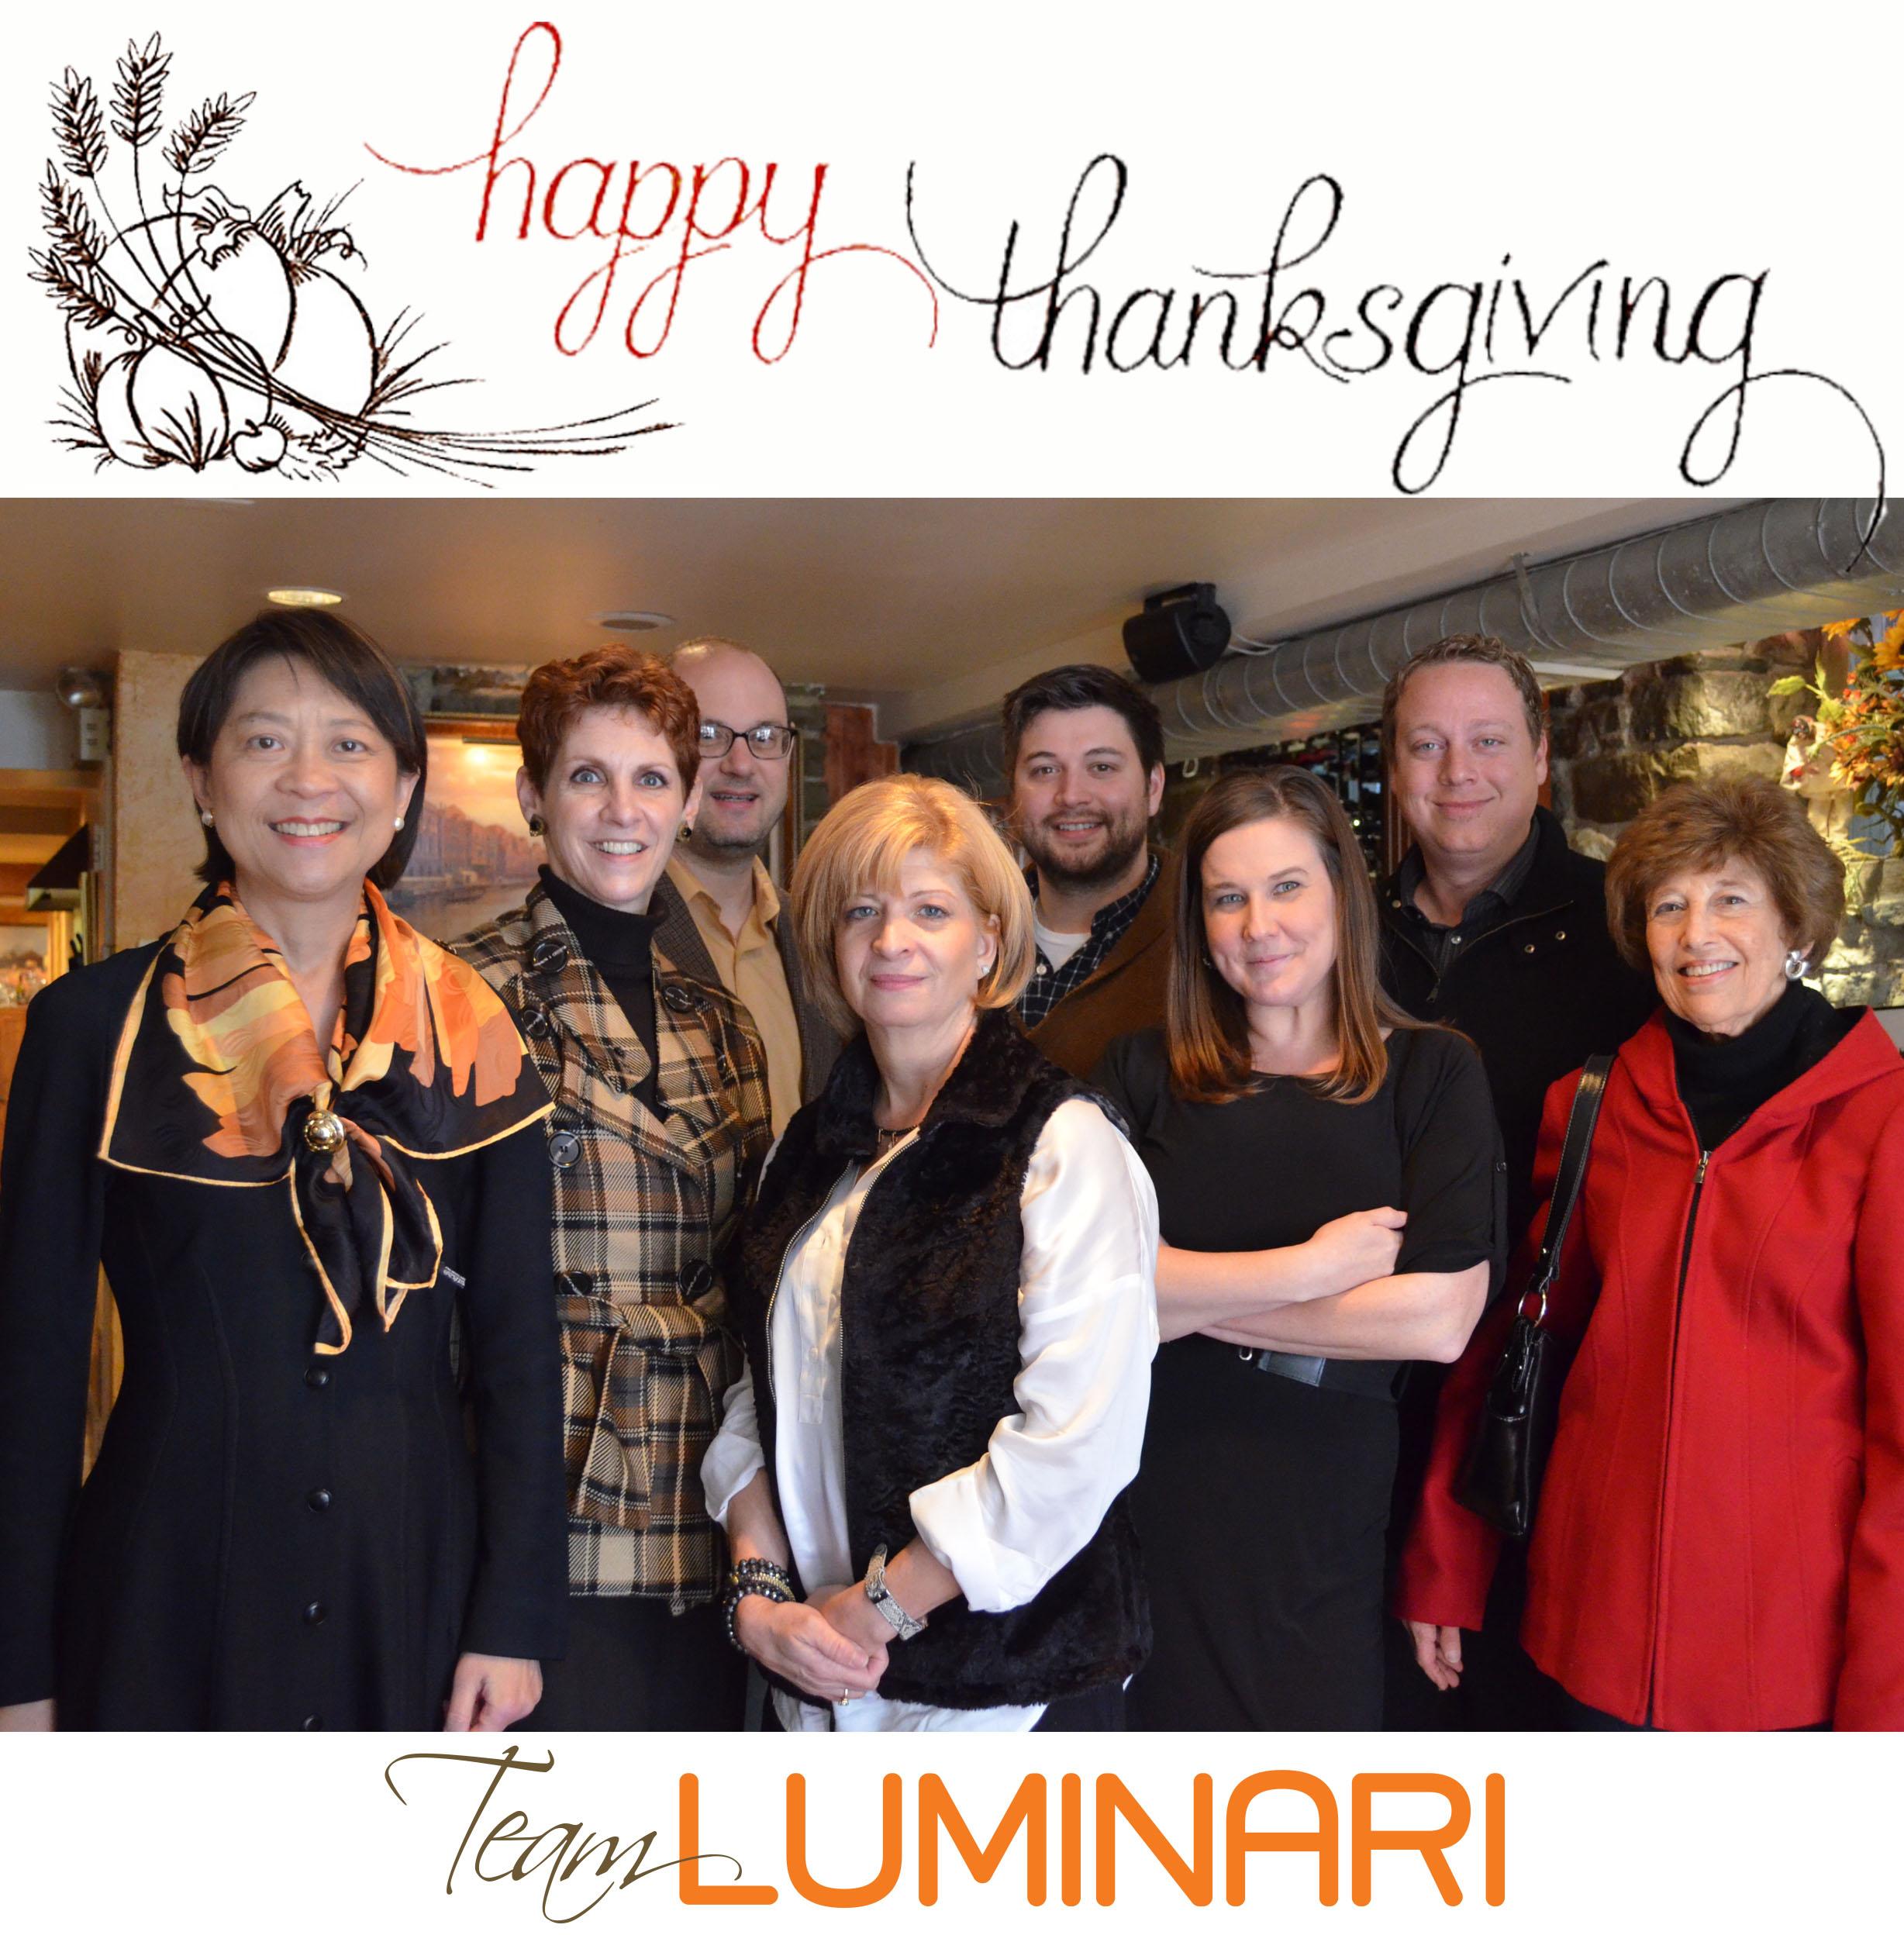 #InspireMe - our inspiration is Team Luminari Collaborators